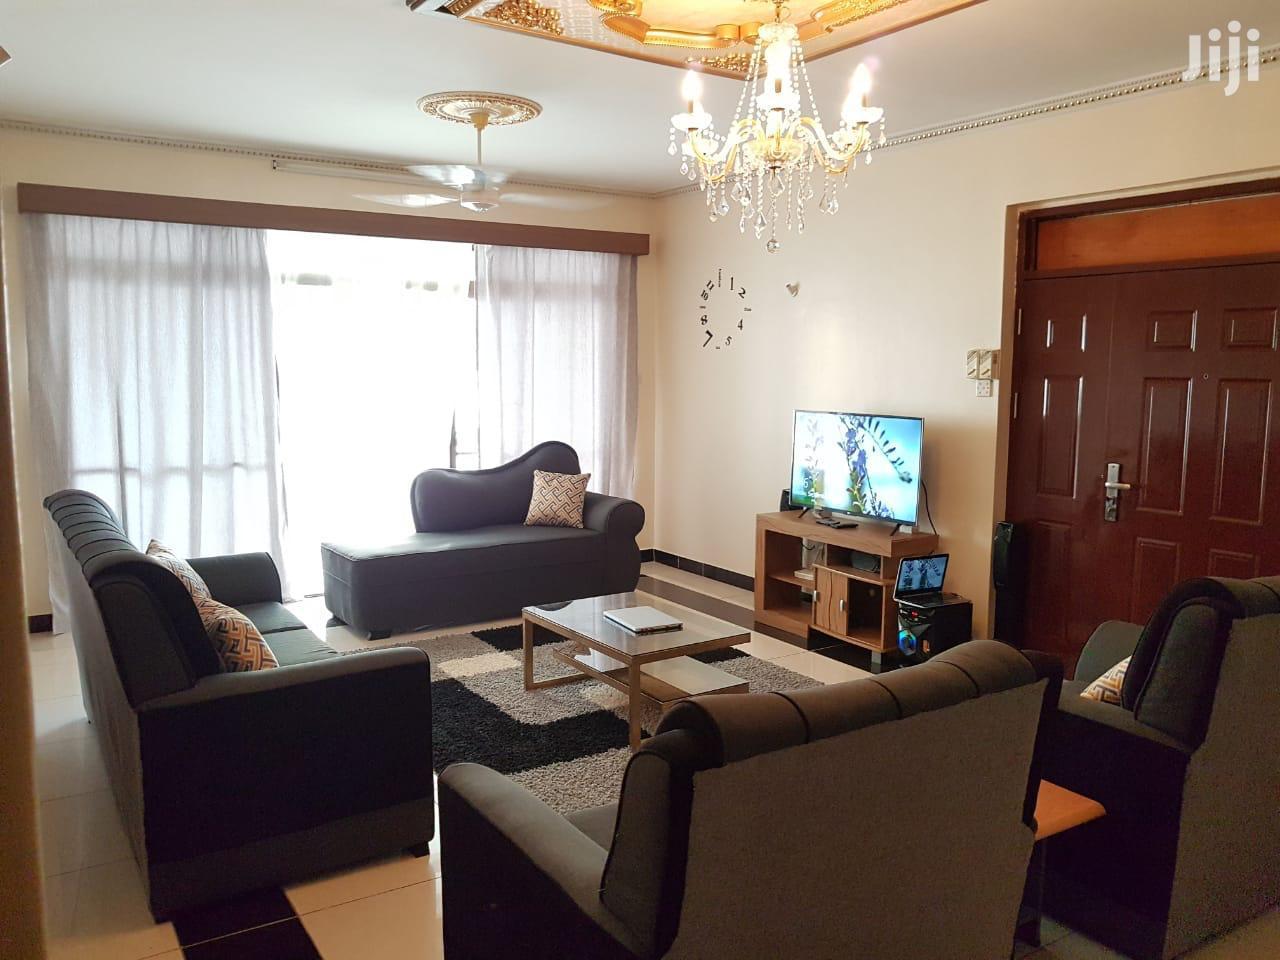 4 Bedrooms Apartments